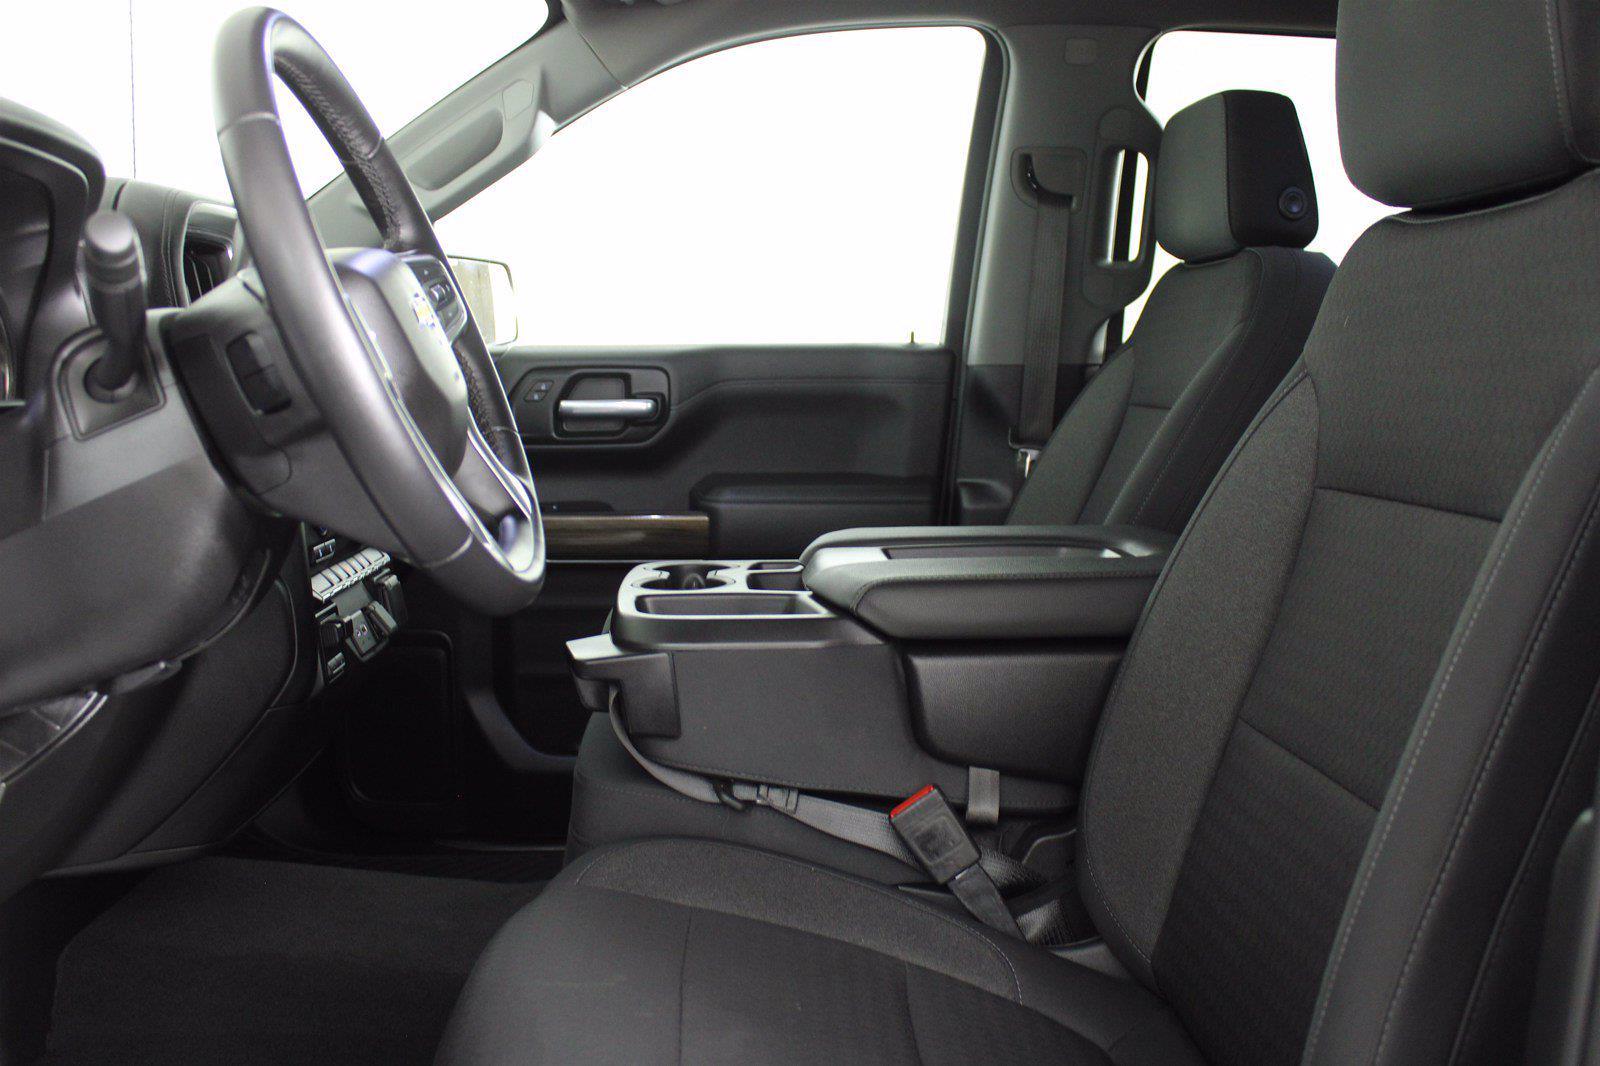 2020 Silverado 1500 Crew Cab 4x4,  Pickup #DAA0146 - photo 9